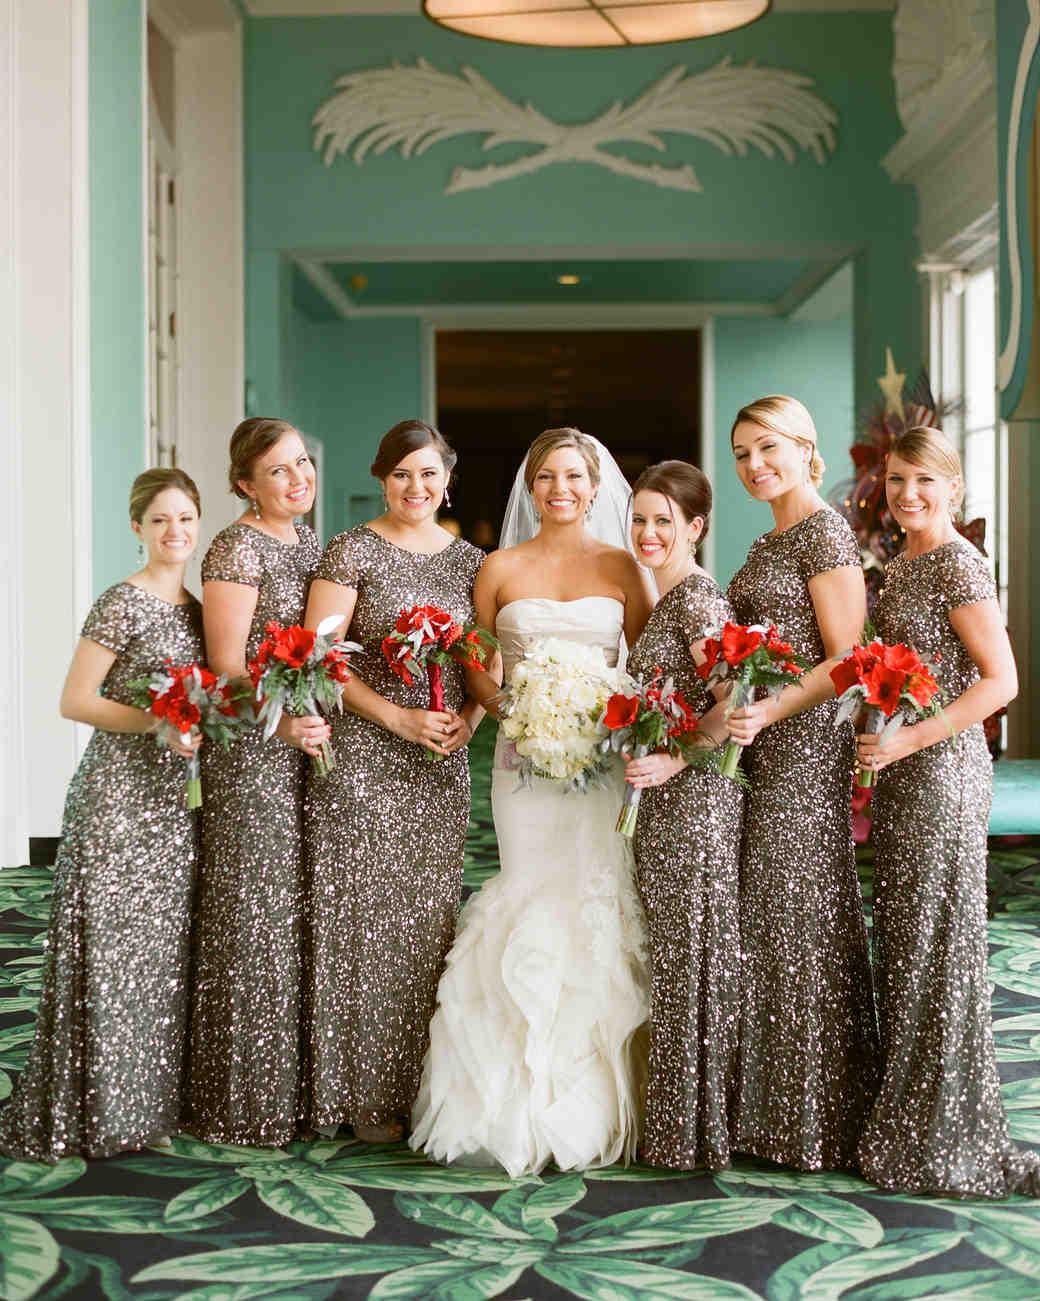 26 Chic Bridal Parties Wearing AllWhite Dresses Martha Stewart